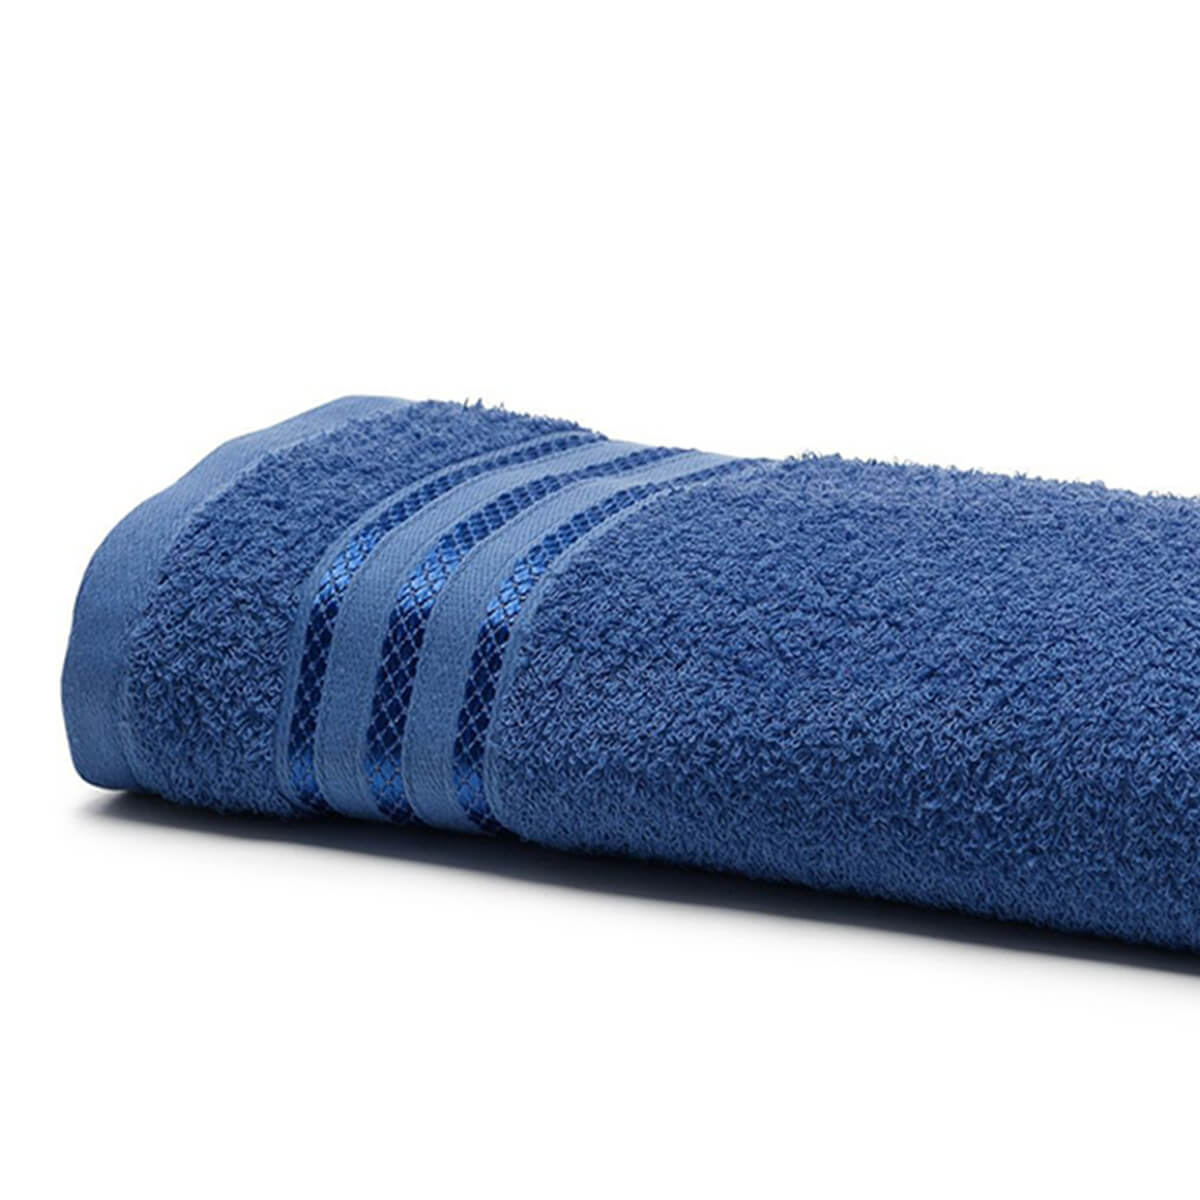 Toalha de Banho Felpuda Royal Patter Azul